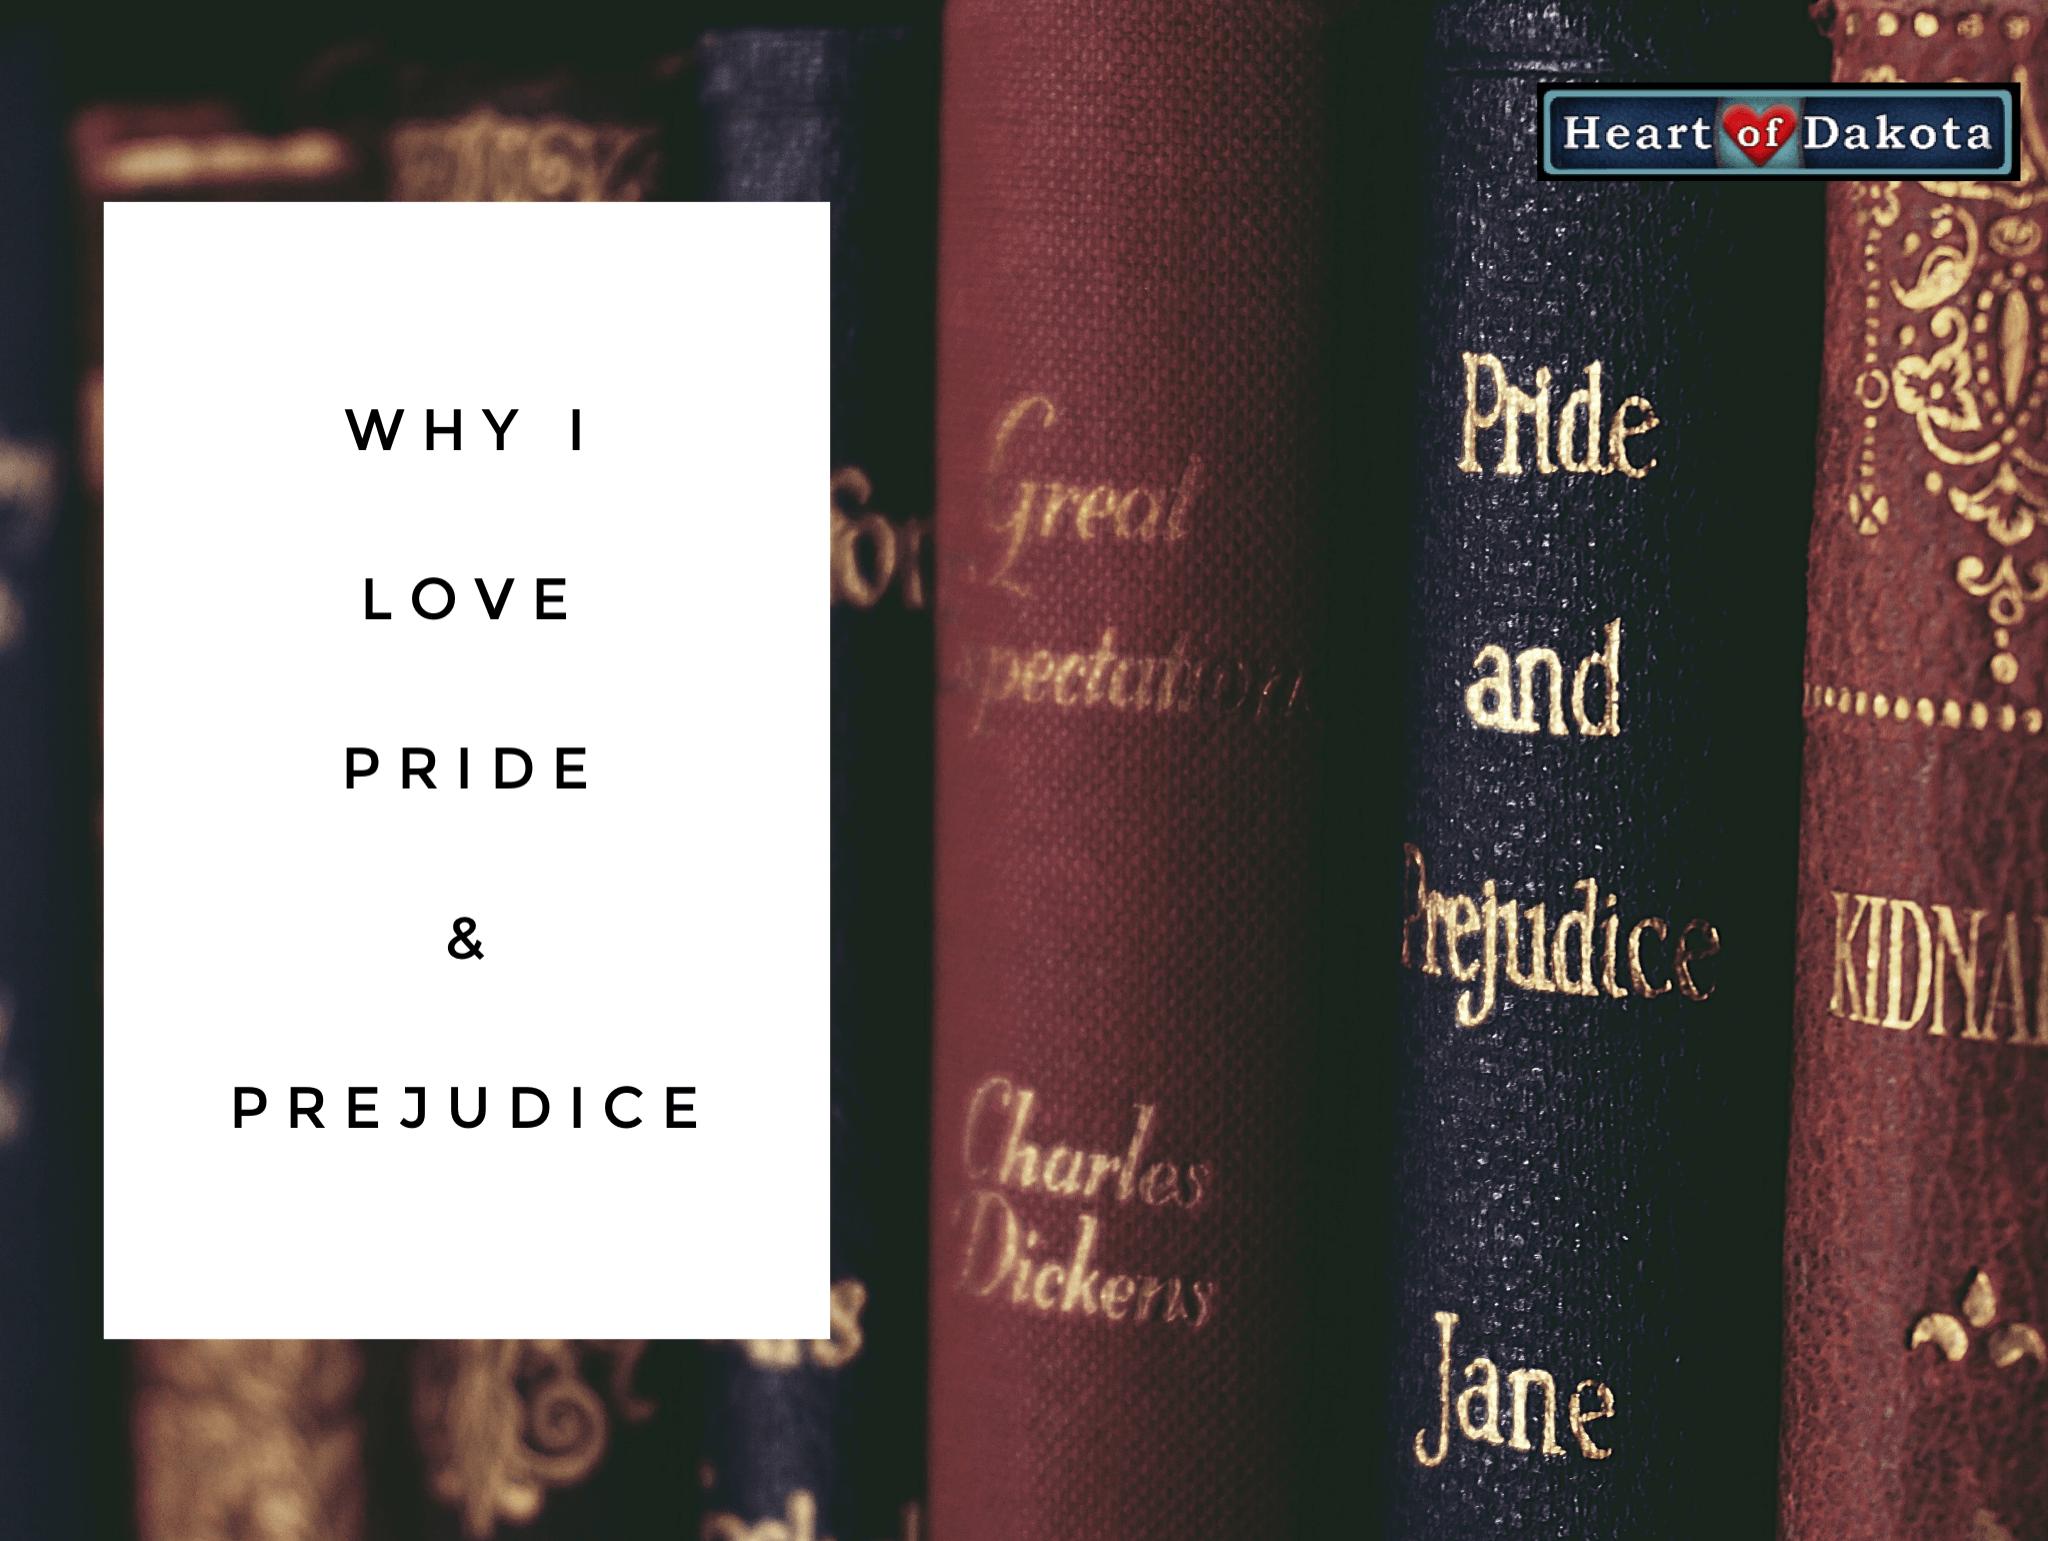 History with Heart of Dakota - Why I Love Pride and Prejudice